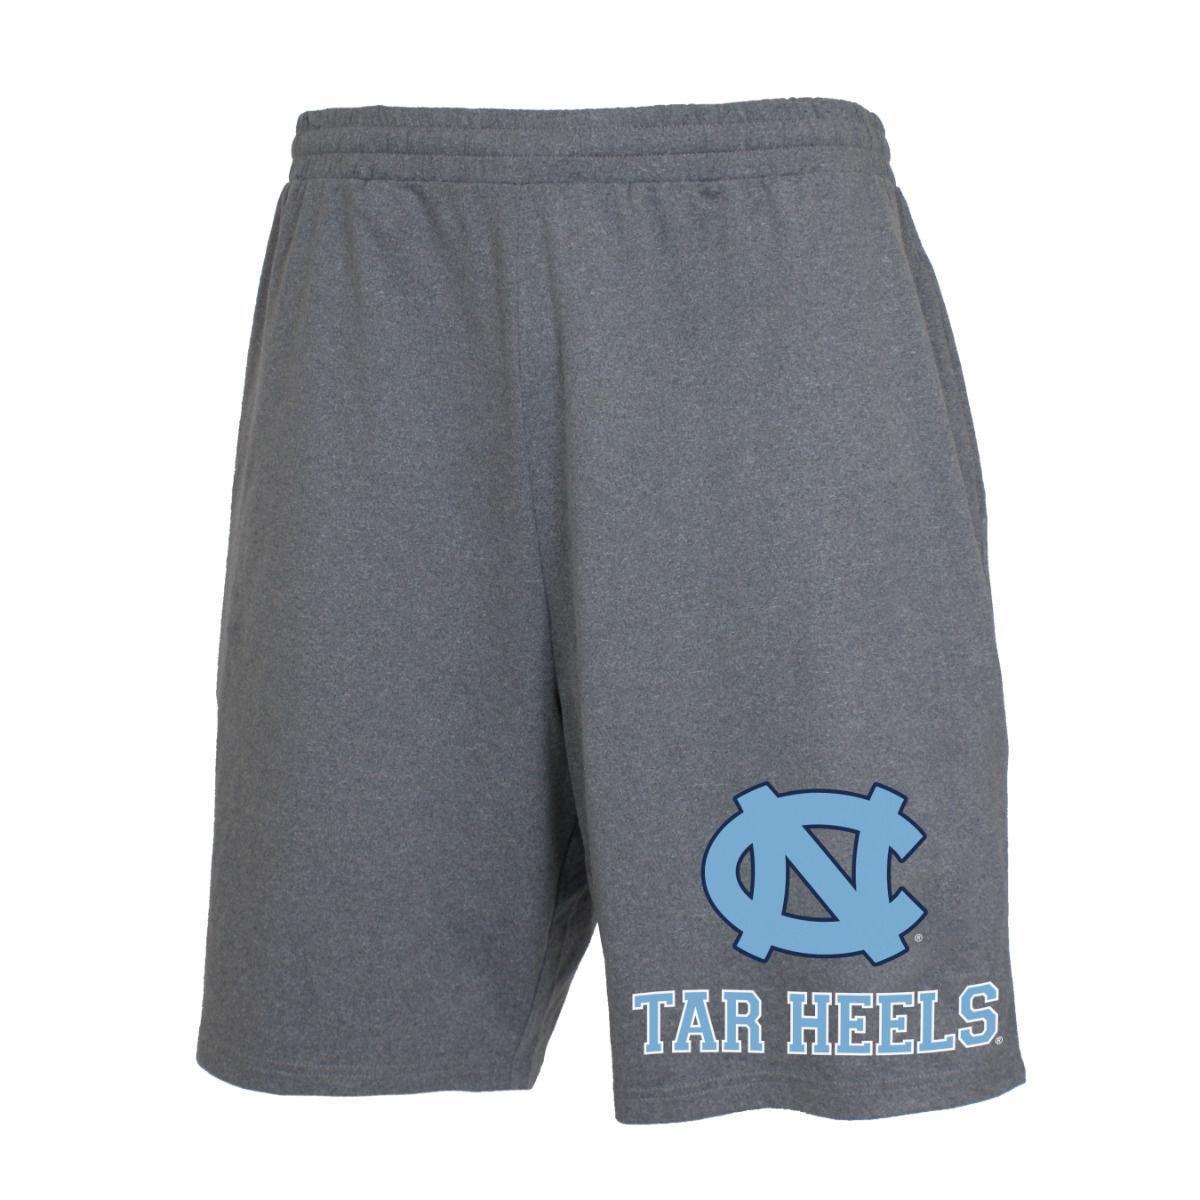 UNC Tar Heels Men's Tactic Jam Shorts Knit Casual Lounge Short Pockets